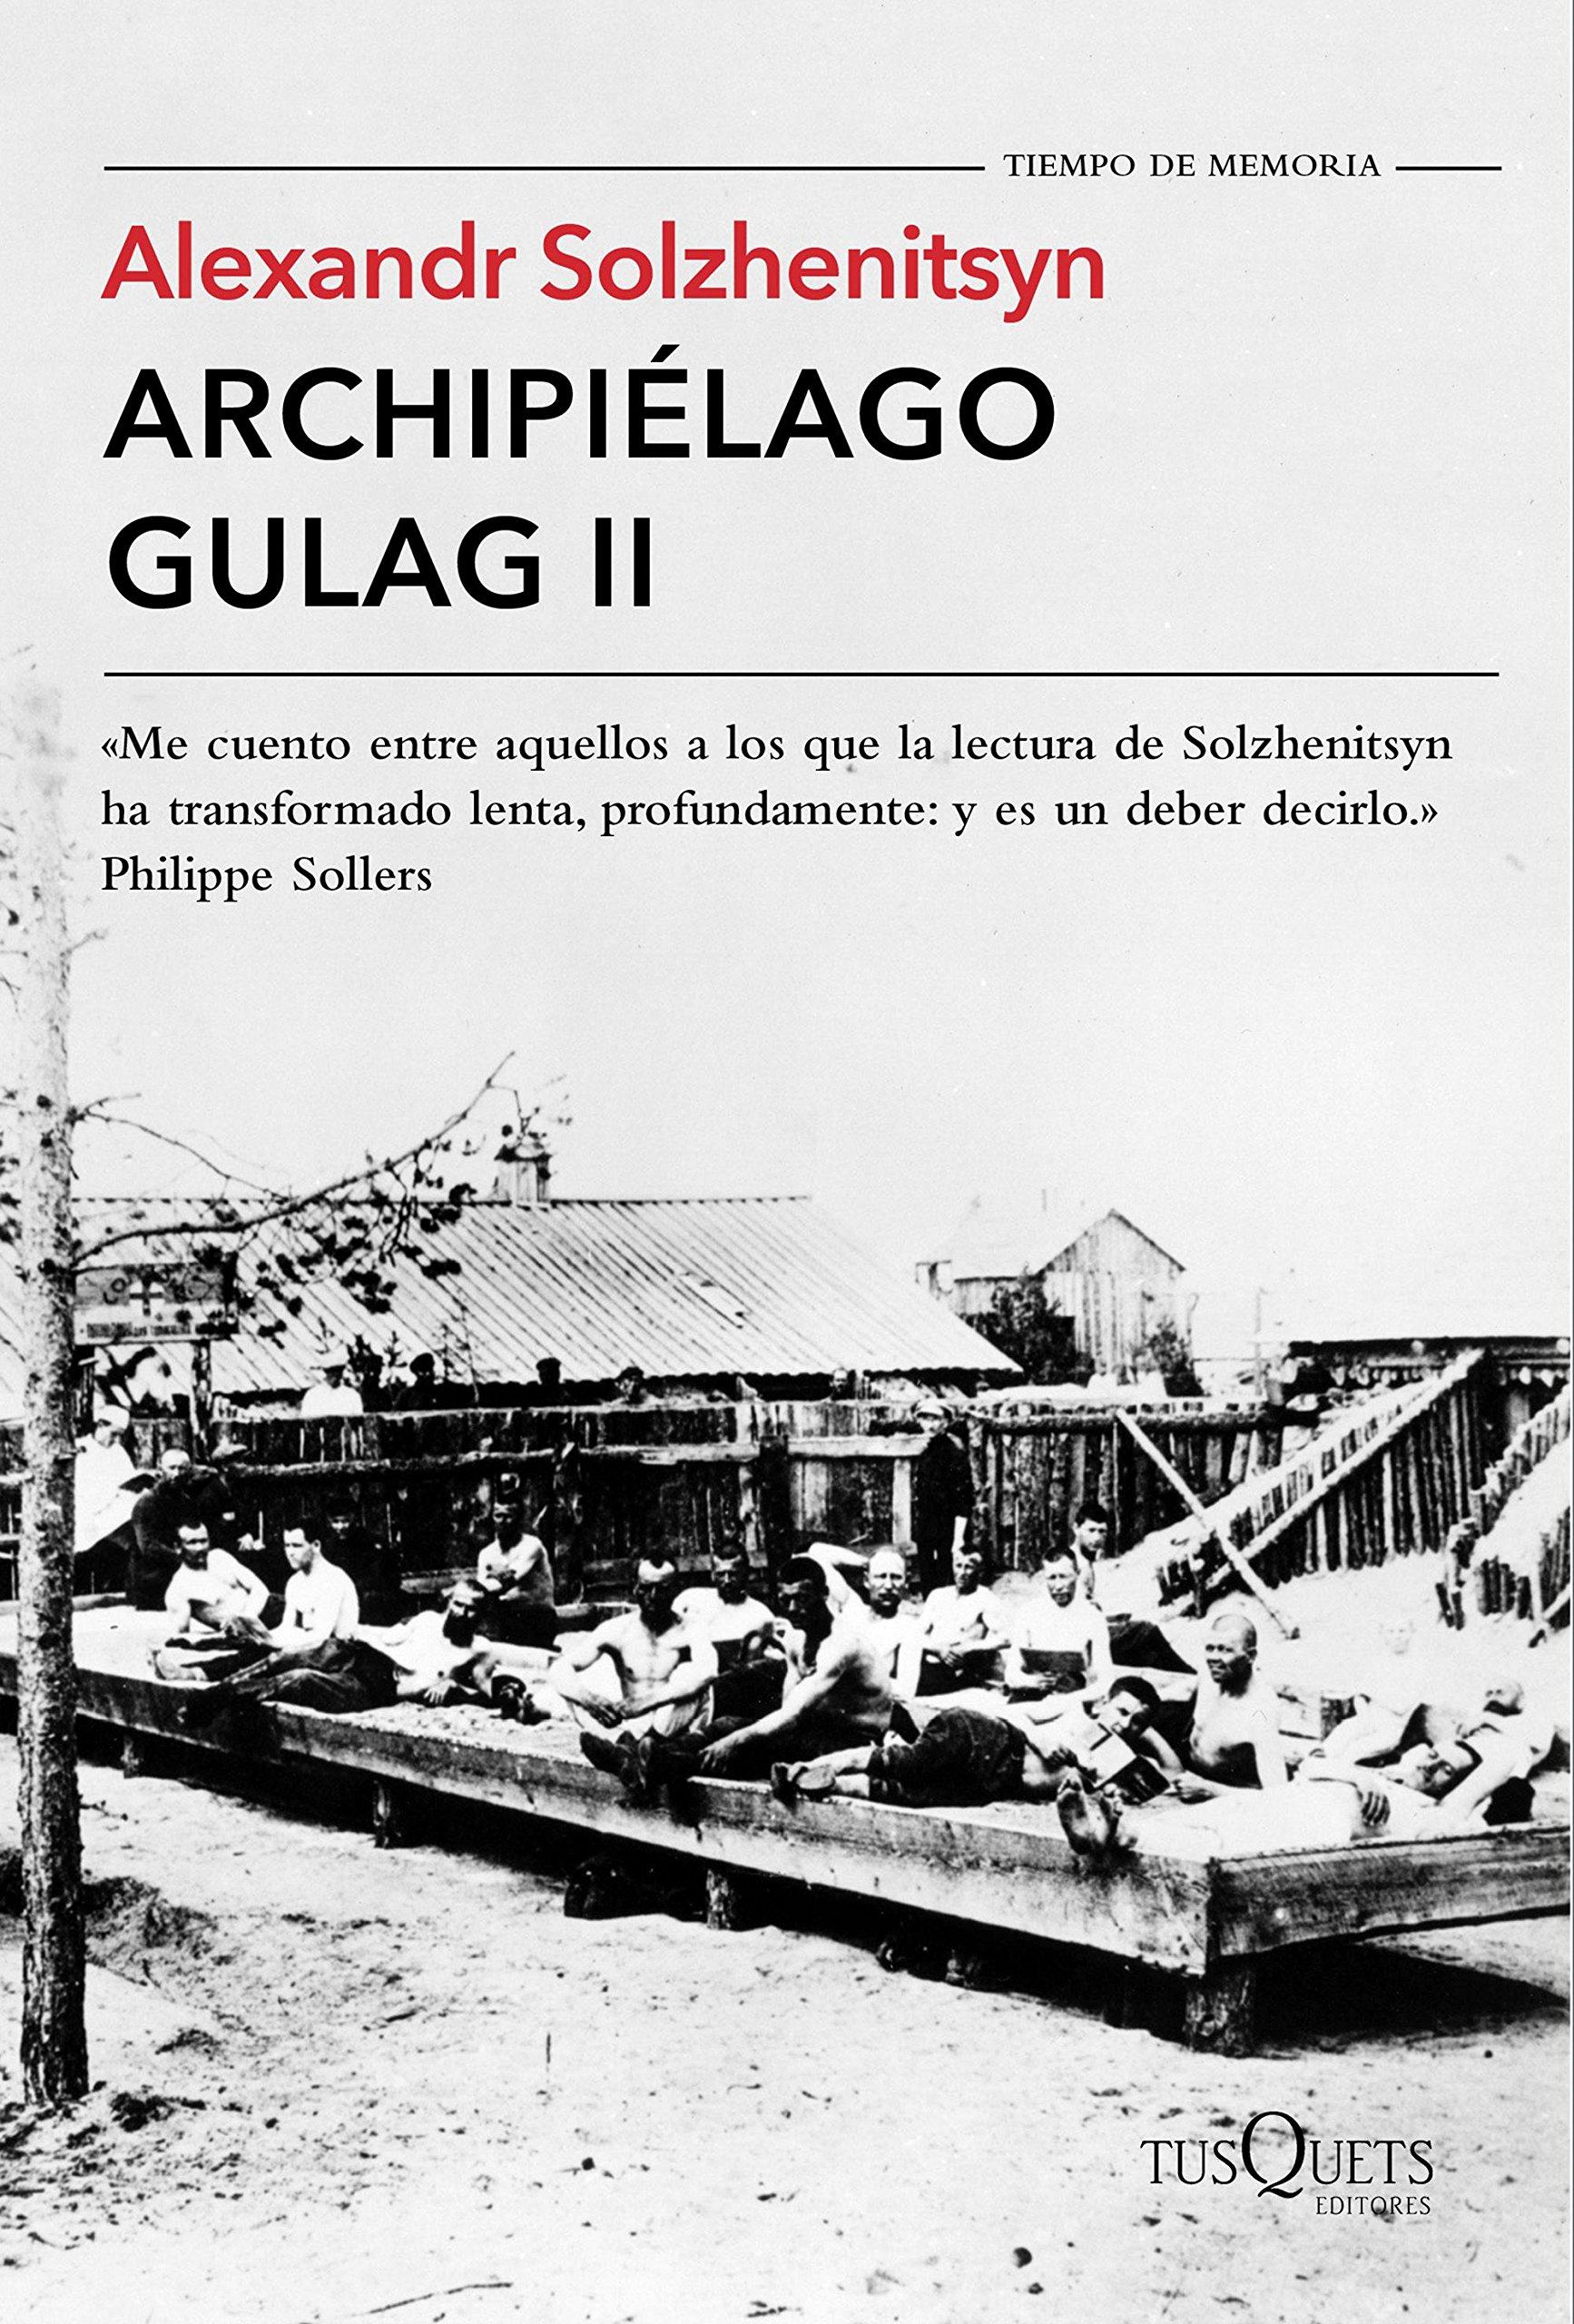 Archipiélago Gulag II (Tiempo de Memoria): Amazon.es: Solzhenitsyn ...